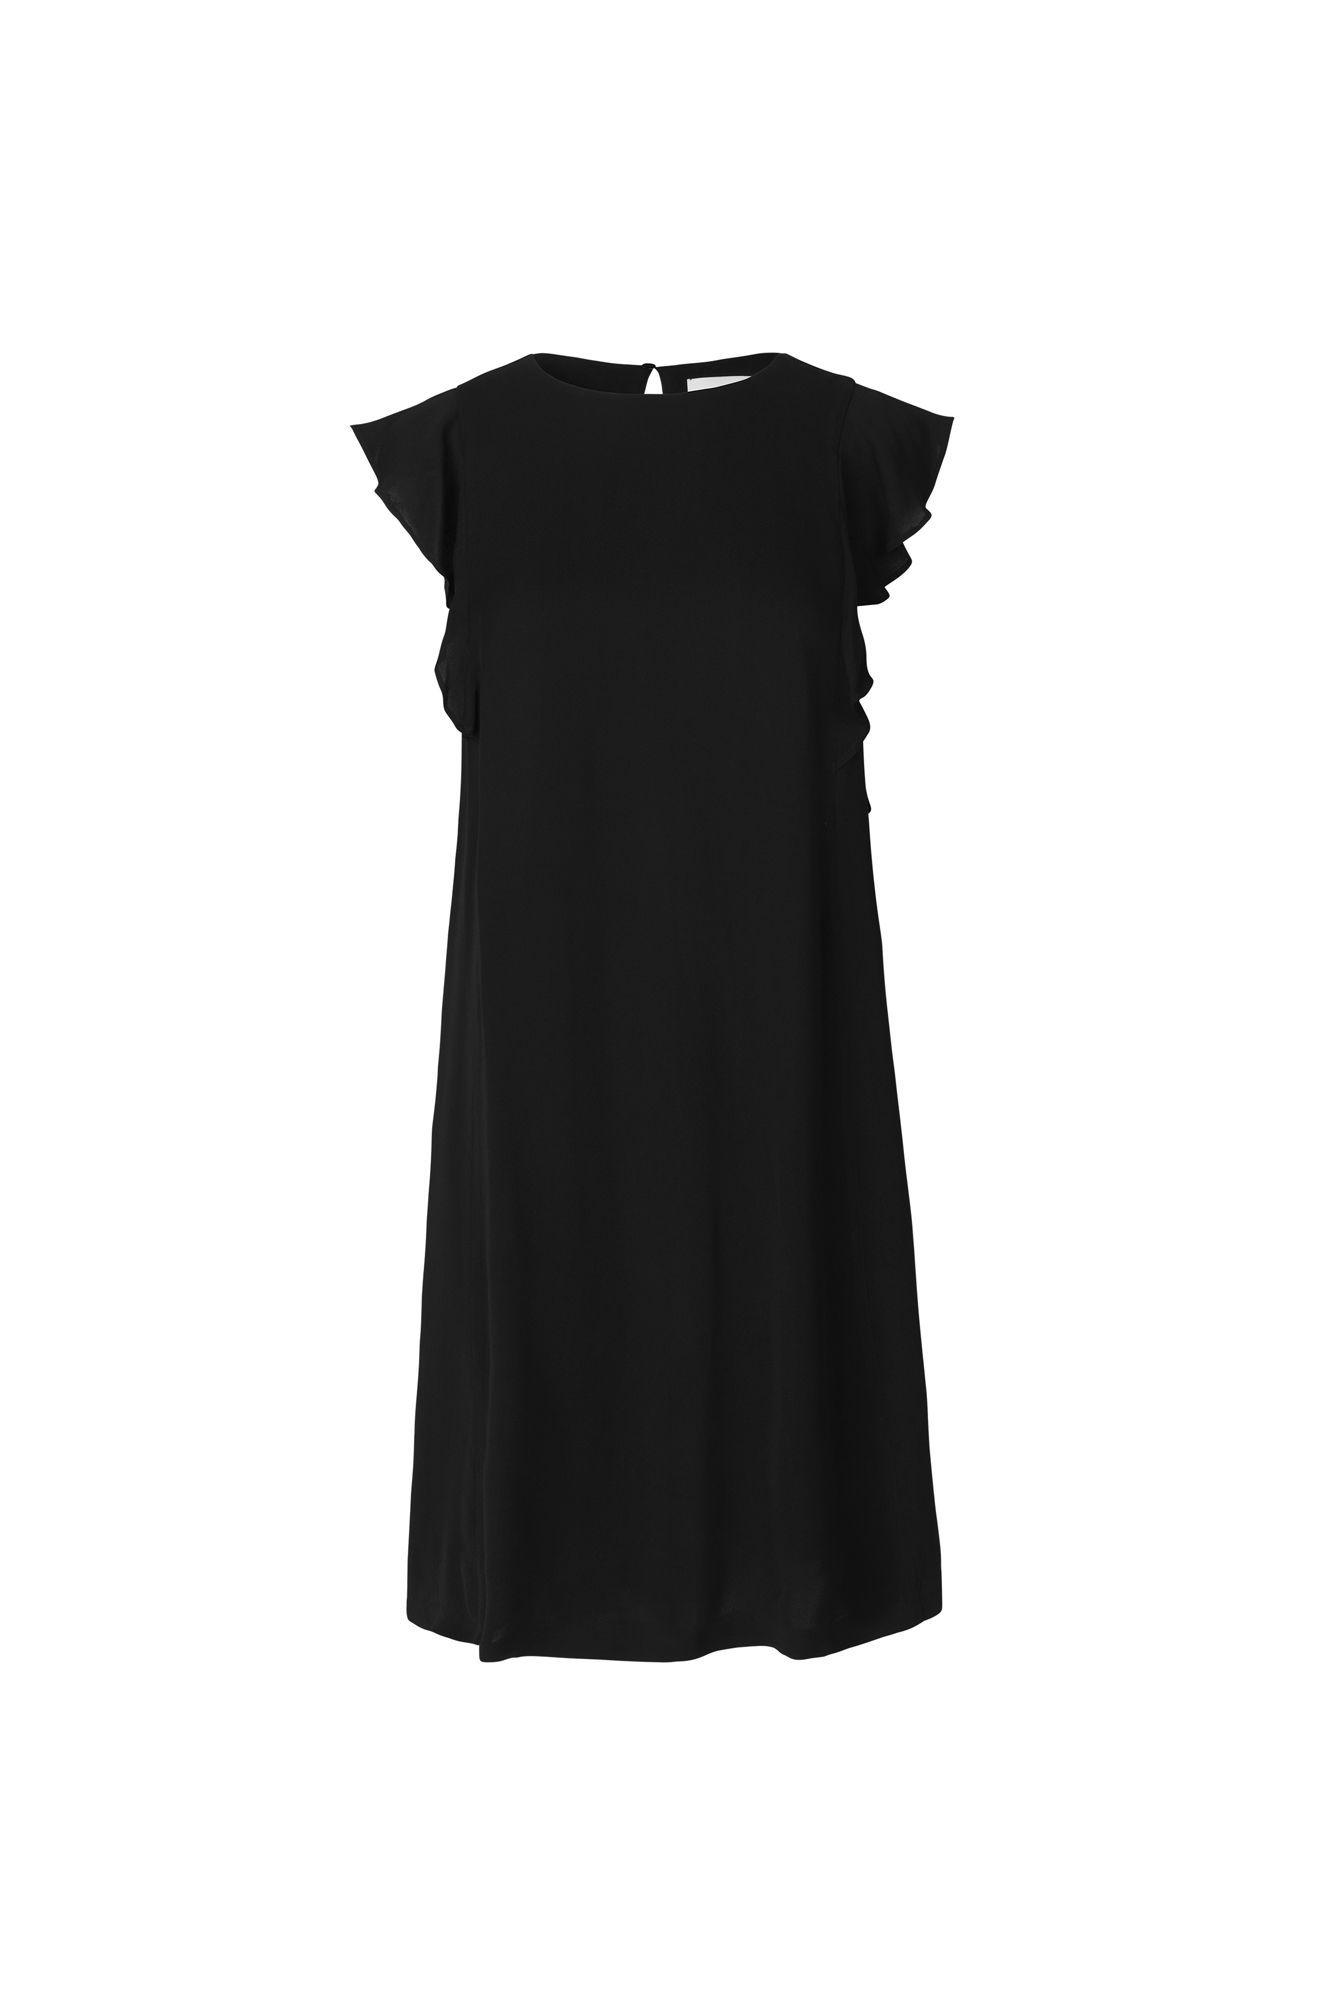 Mentha s dress black my style clothing pinterest